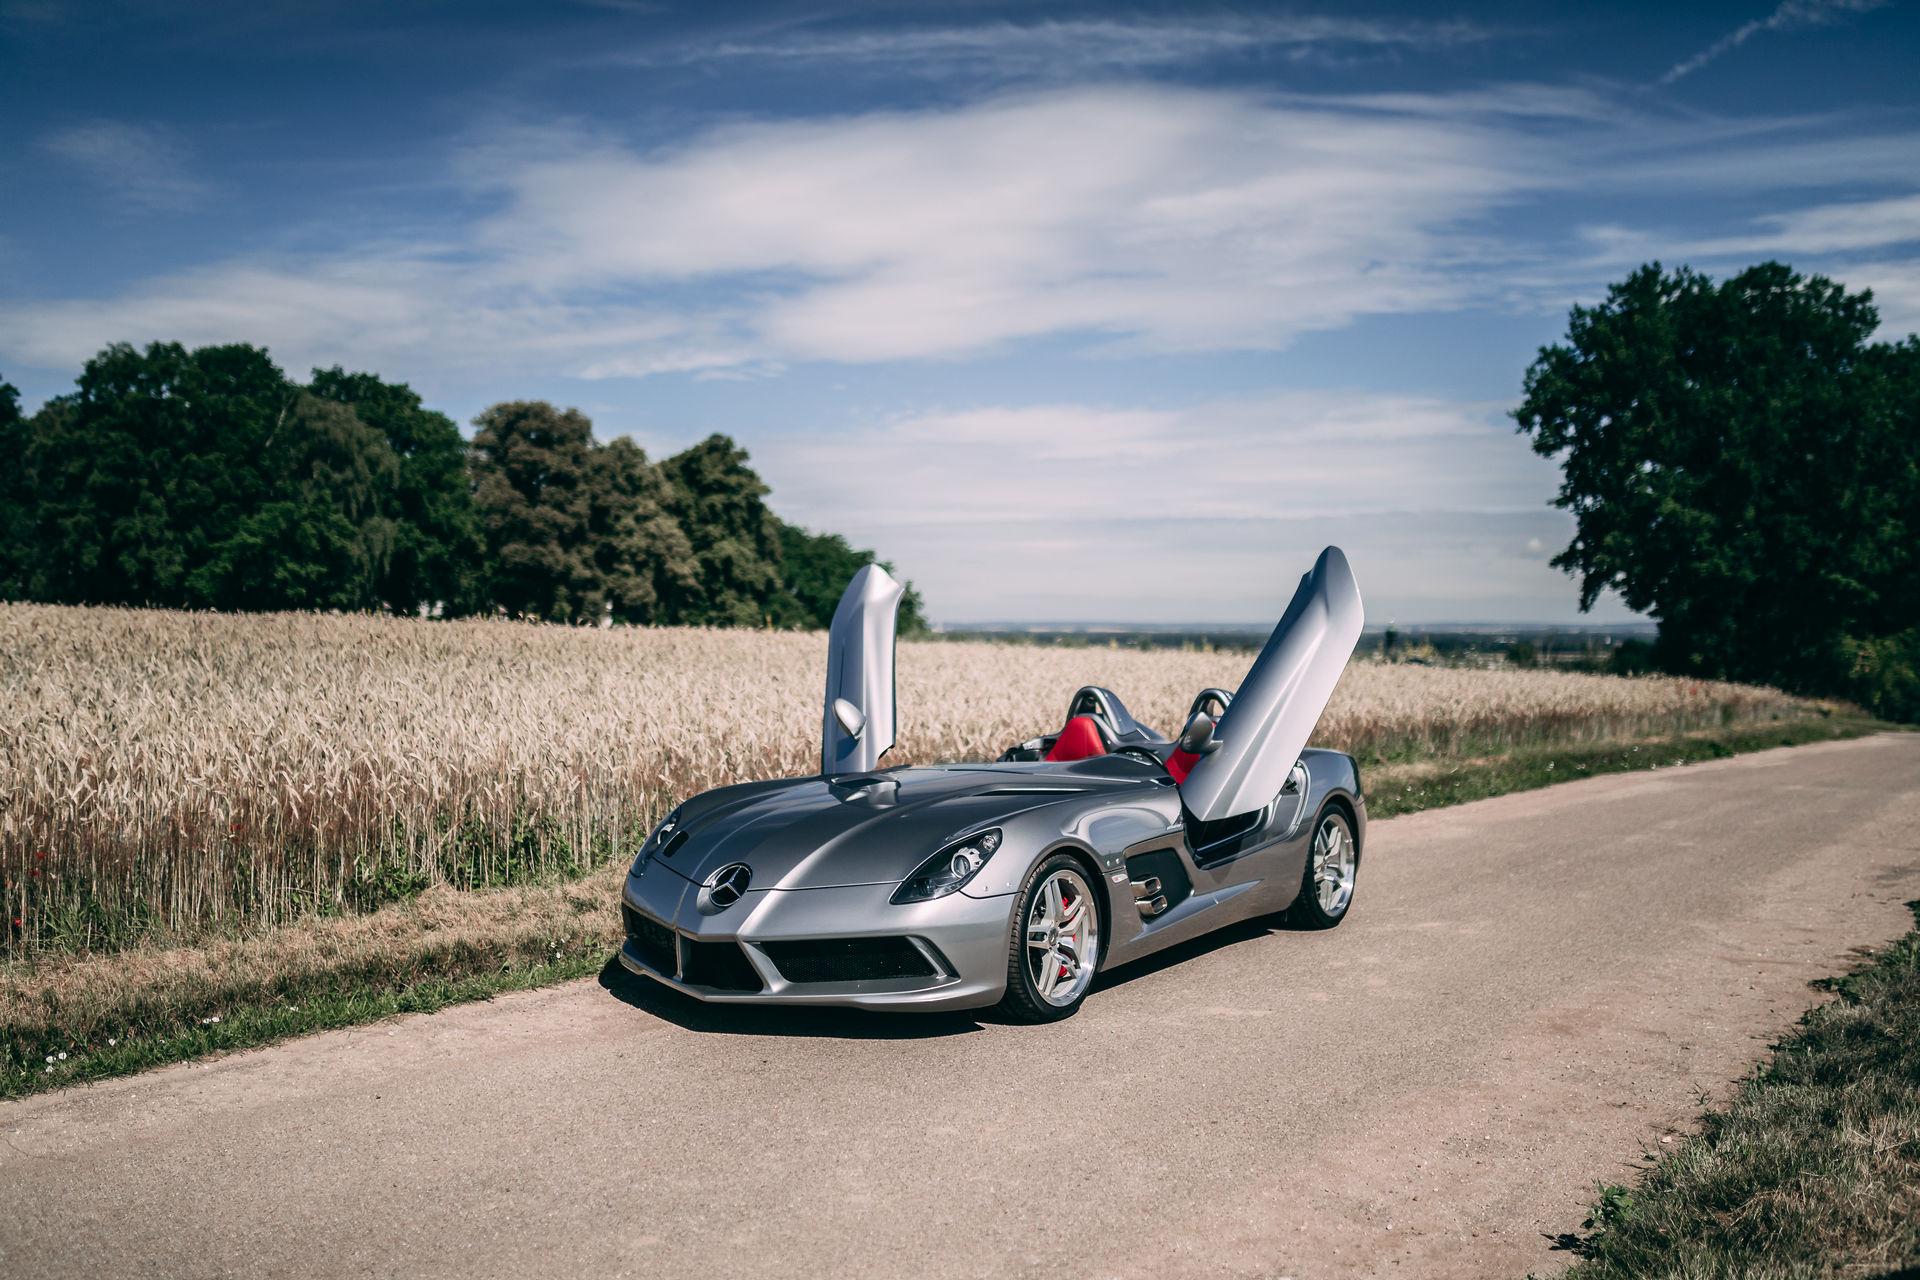 Mercedes SLR McLaren Stirling Moss